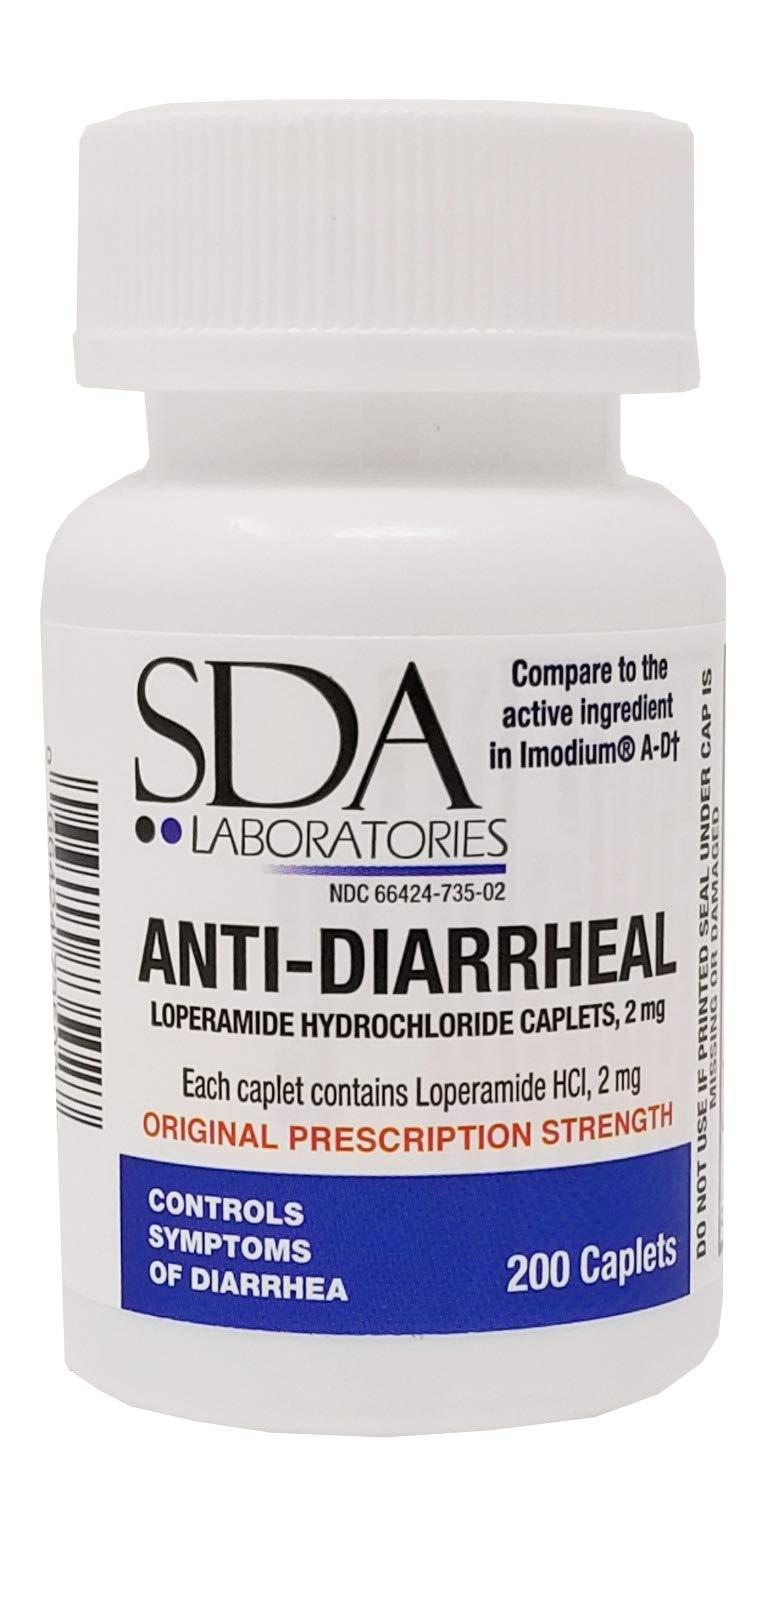 Anti-Diarrheal 2MG 200 Caplets by SDA Labs by SDA LABORATORIES